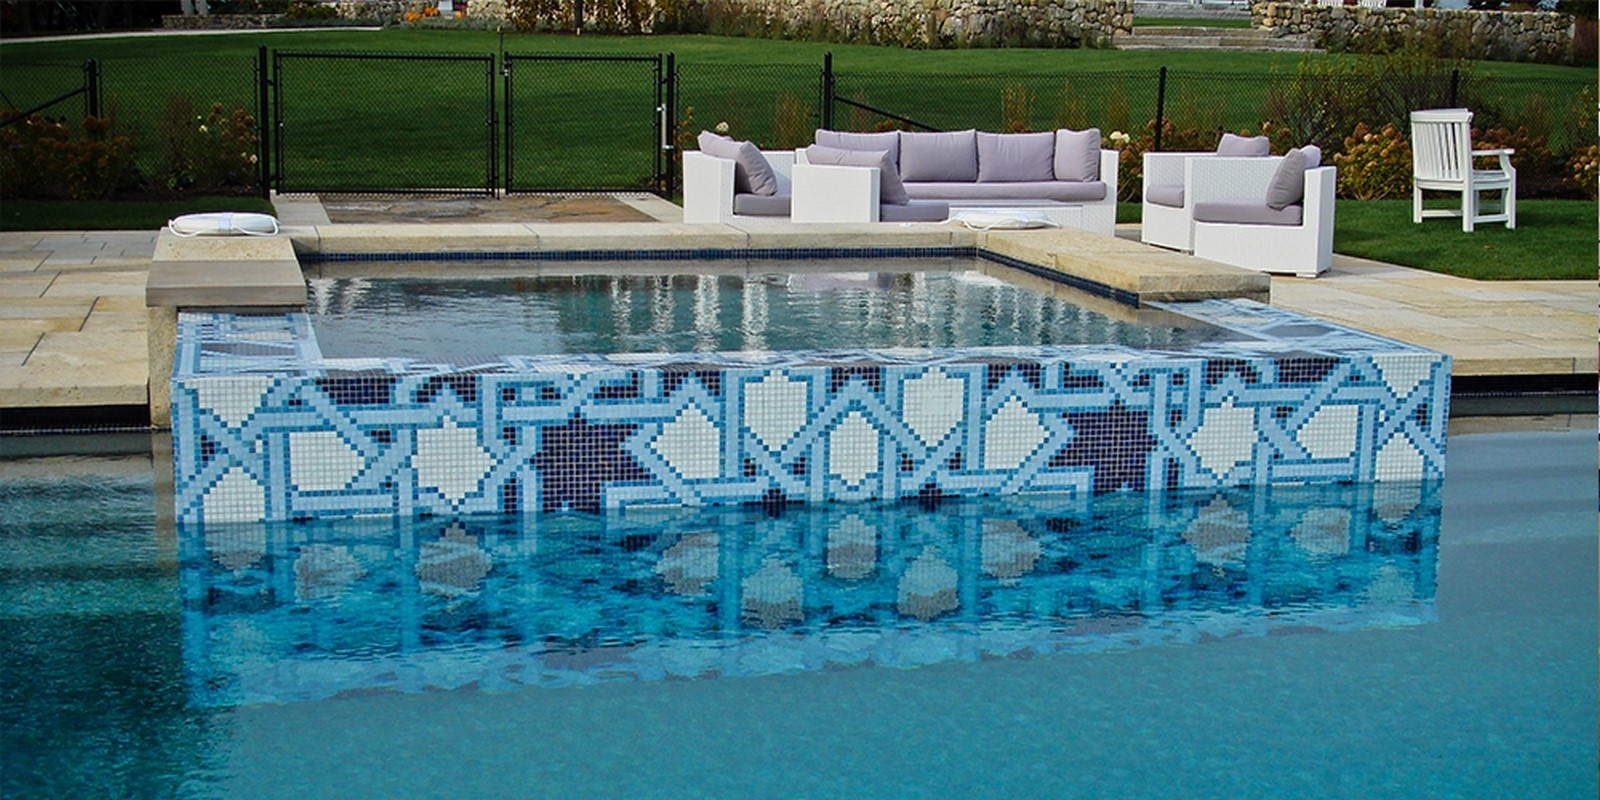 25 flooring patterns for Swimming Pools - Sheet30